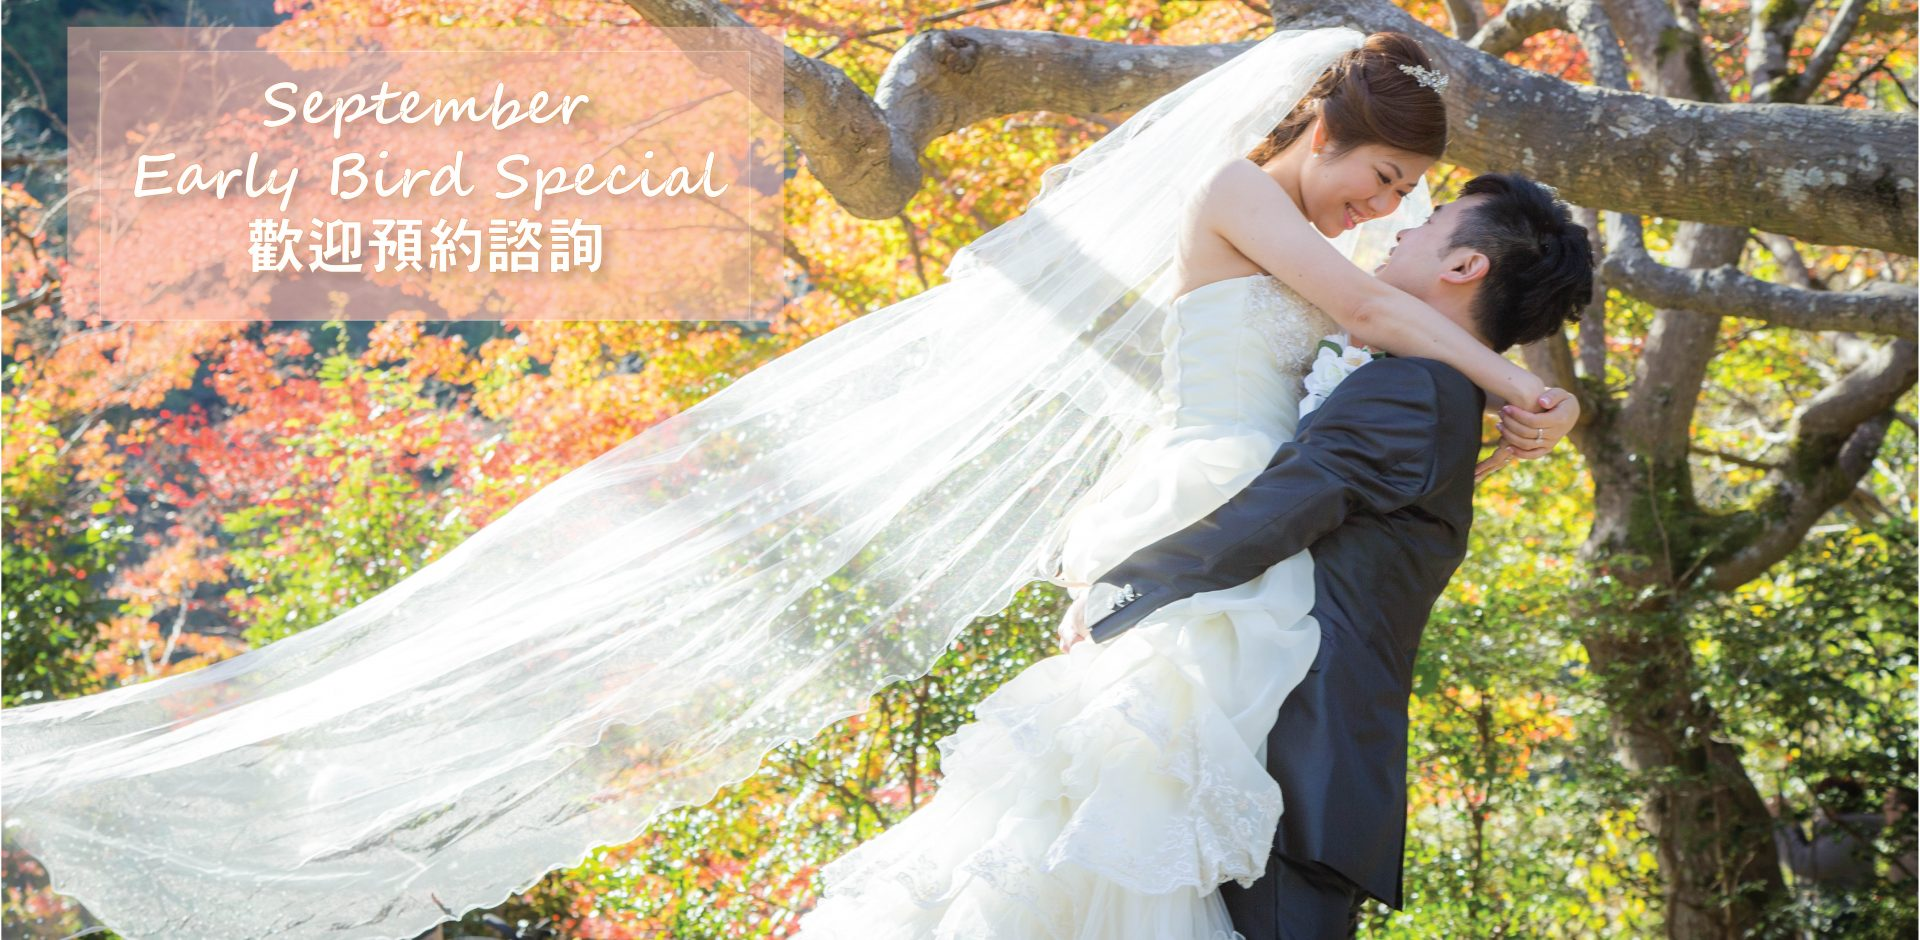 Watabe Wedding 9月中秋早鳥優惠